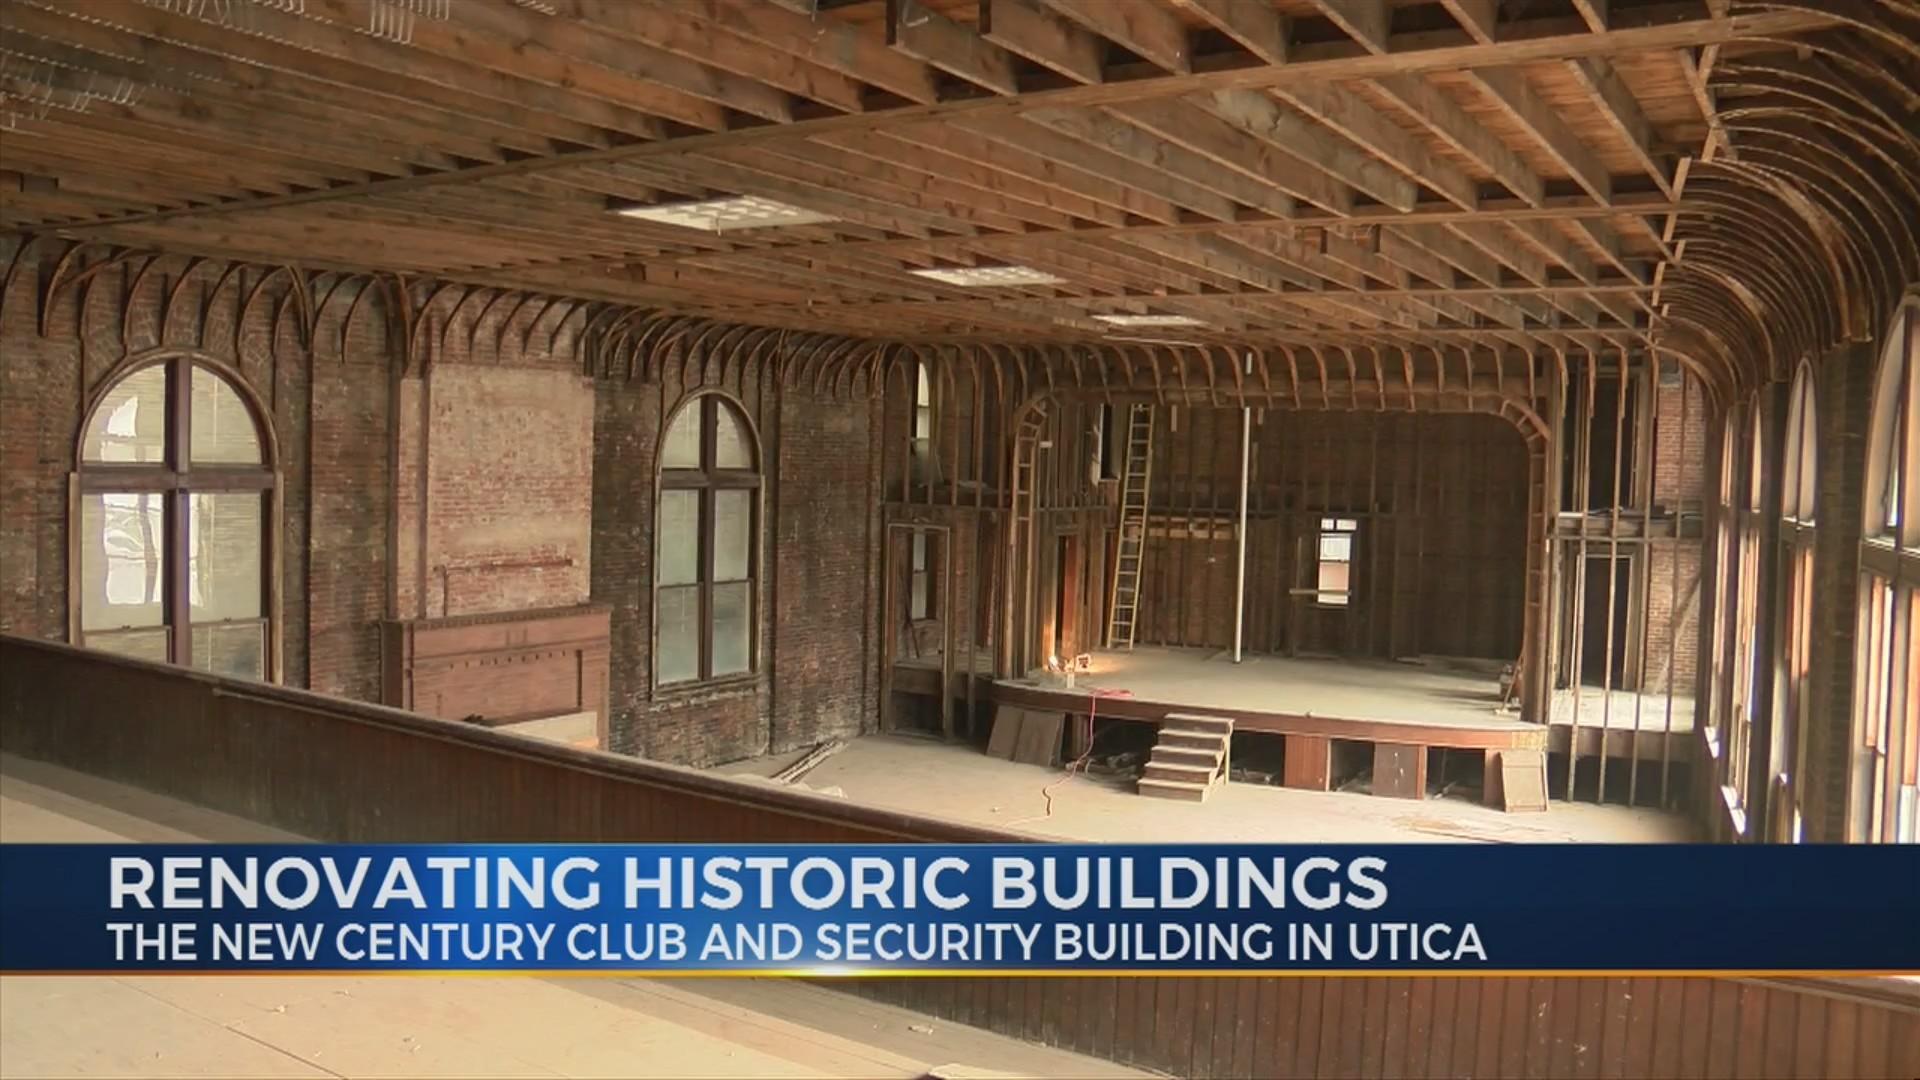 Renovating_Historic_Buildings_0_20181213231437